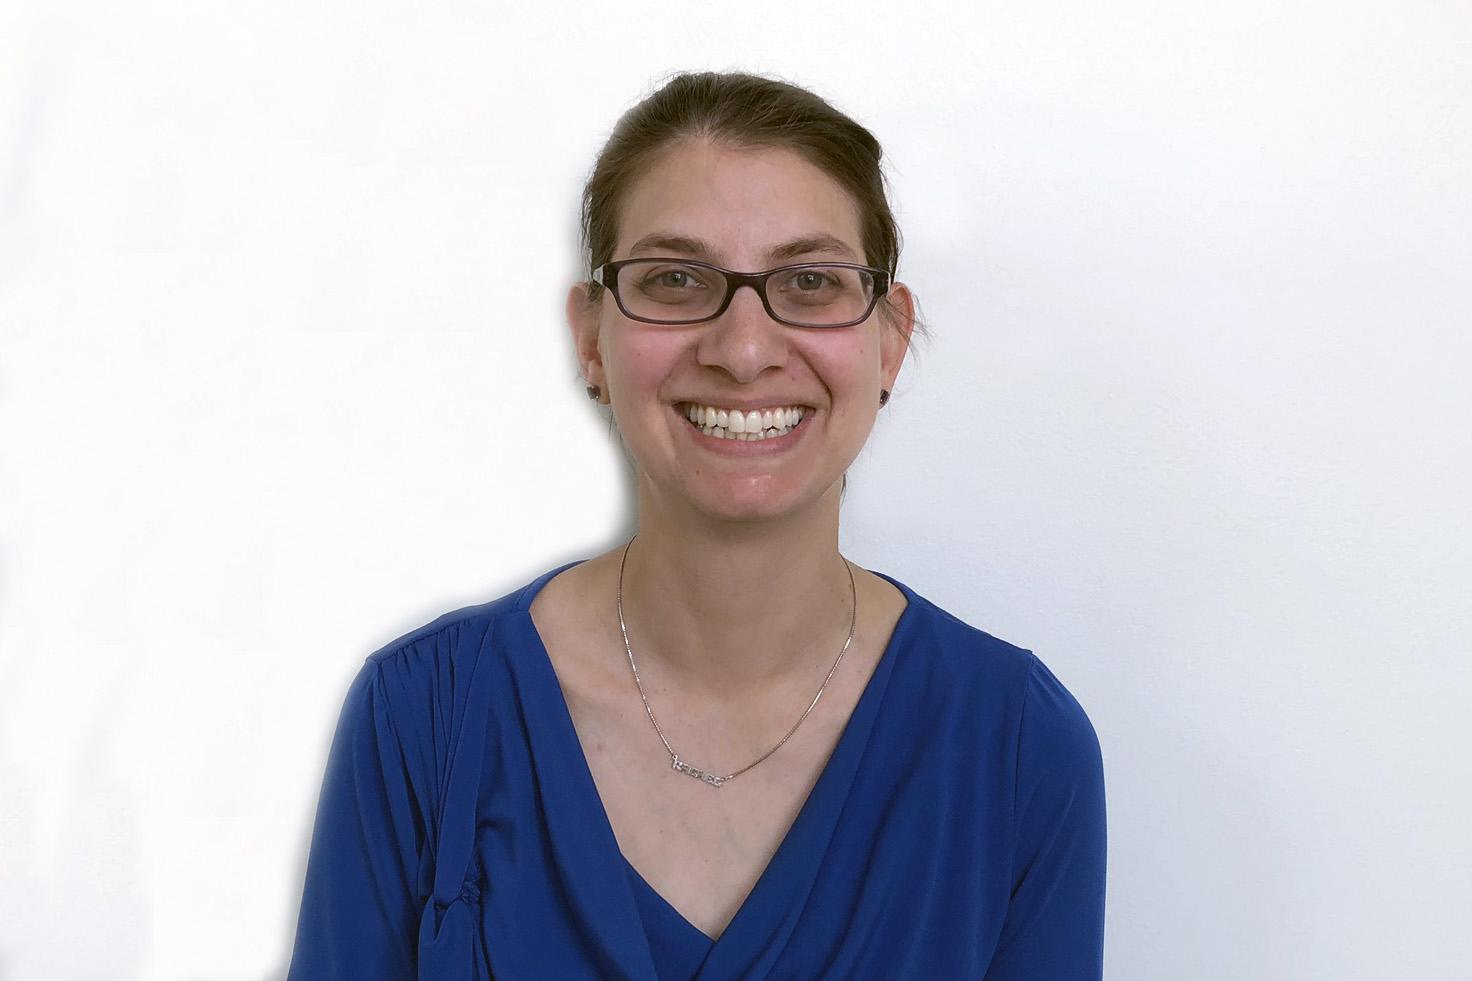 Rachel Plotnick (Photo; Aaron Cain, WFIU)